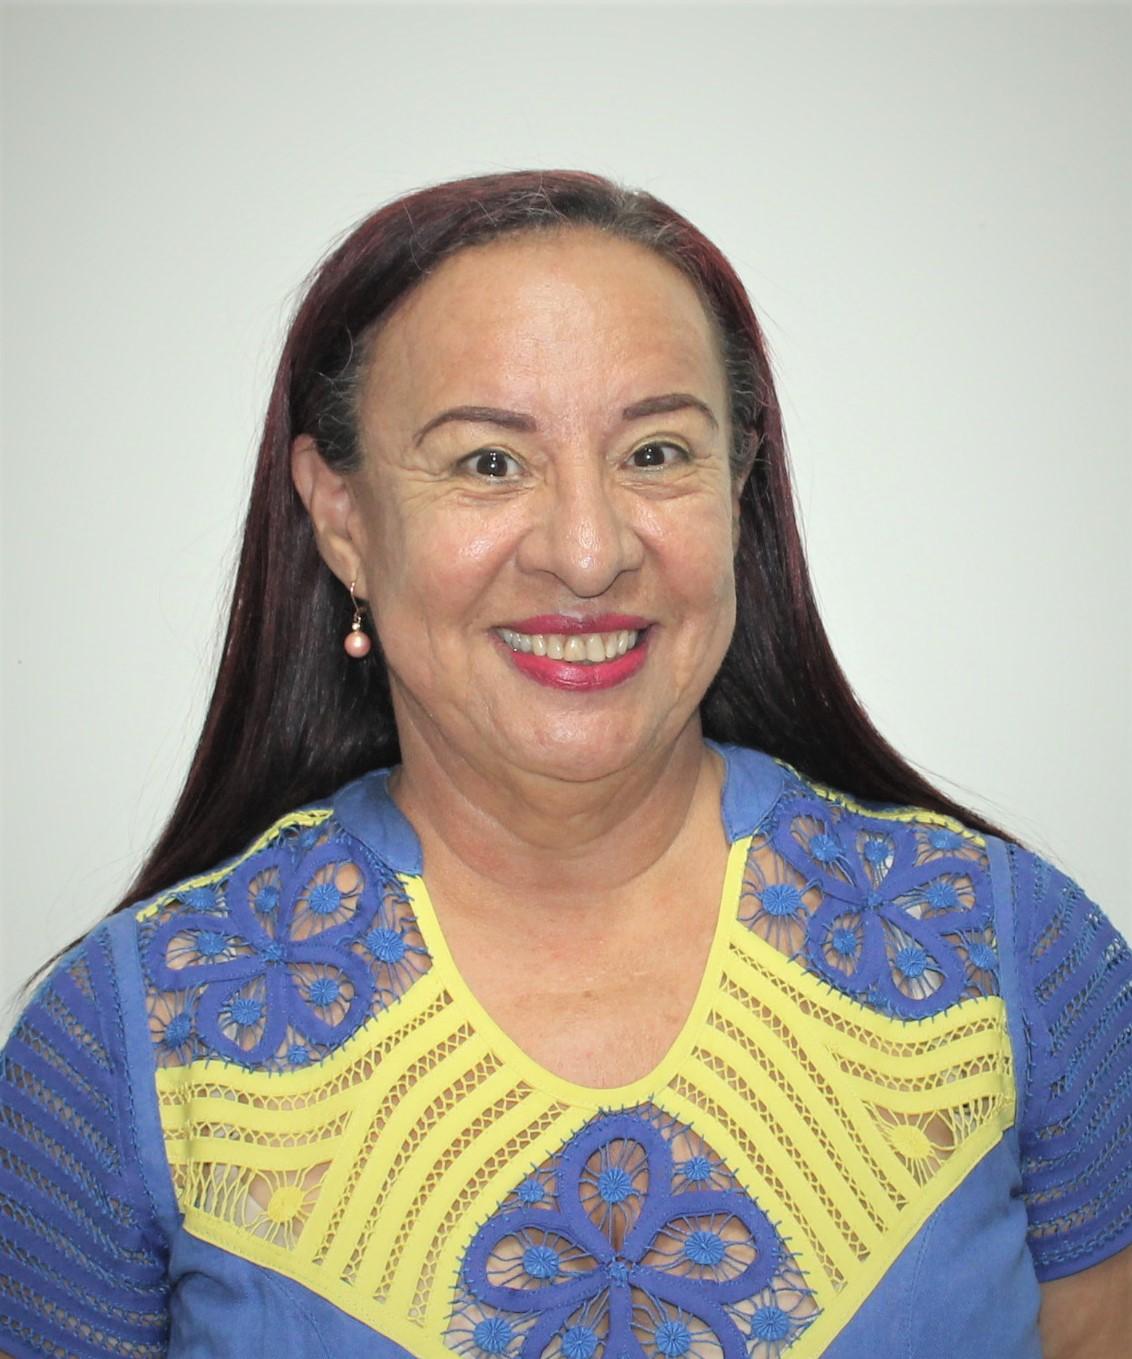 ELIZABETH LÓPEZ RIVAS